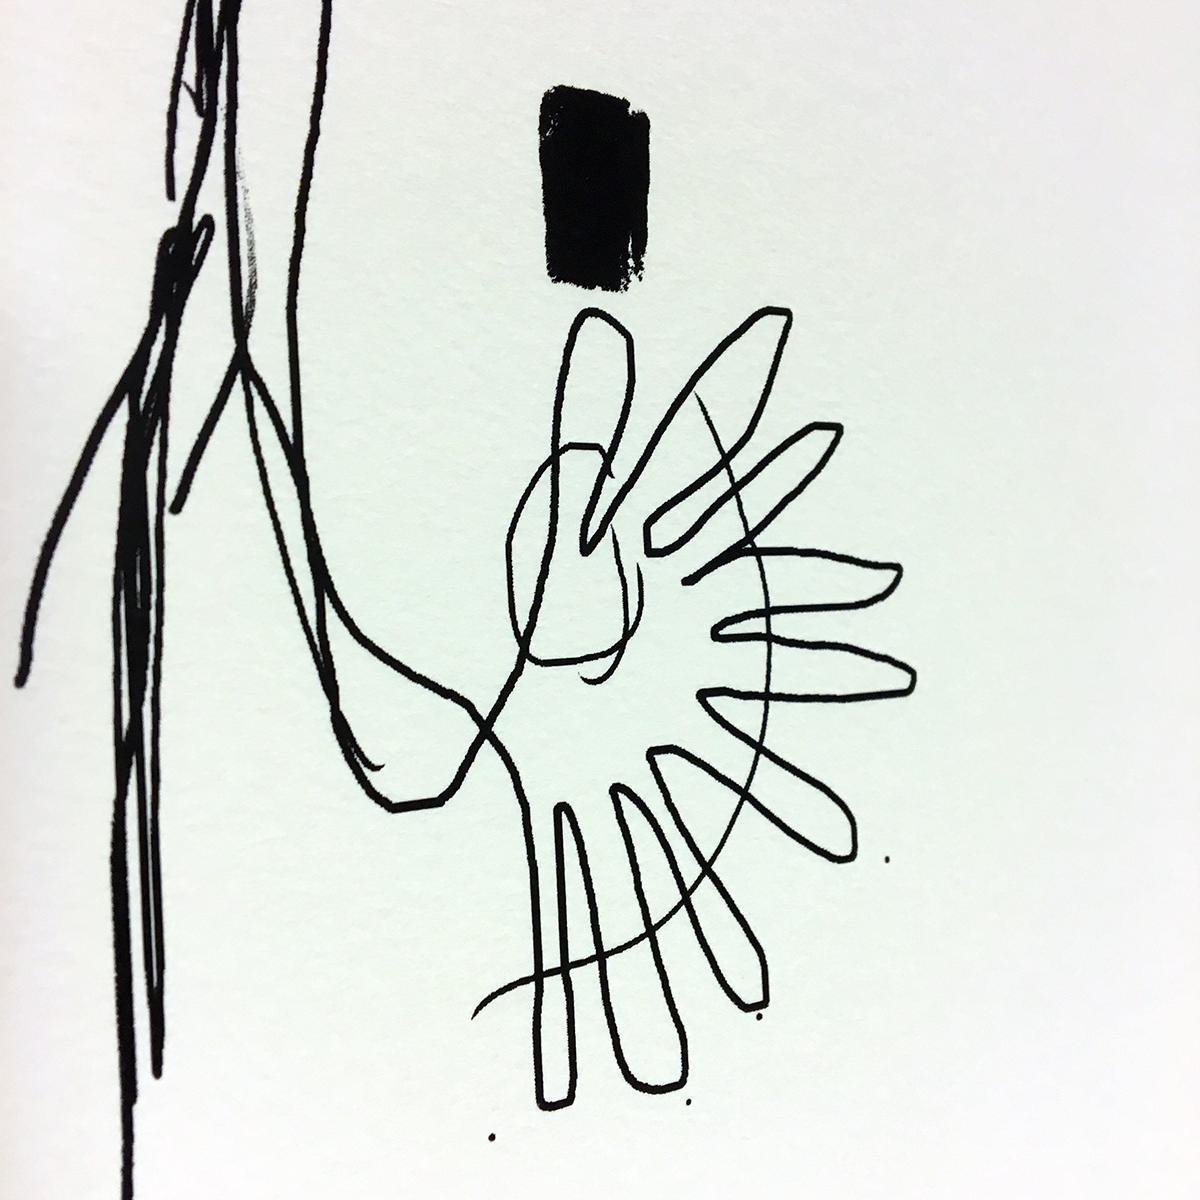 Alternative image for Jazz hands